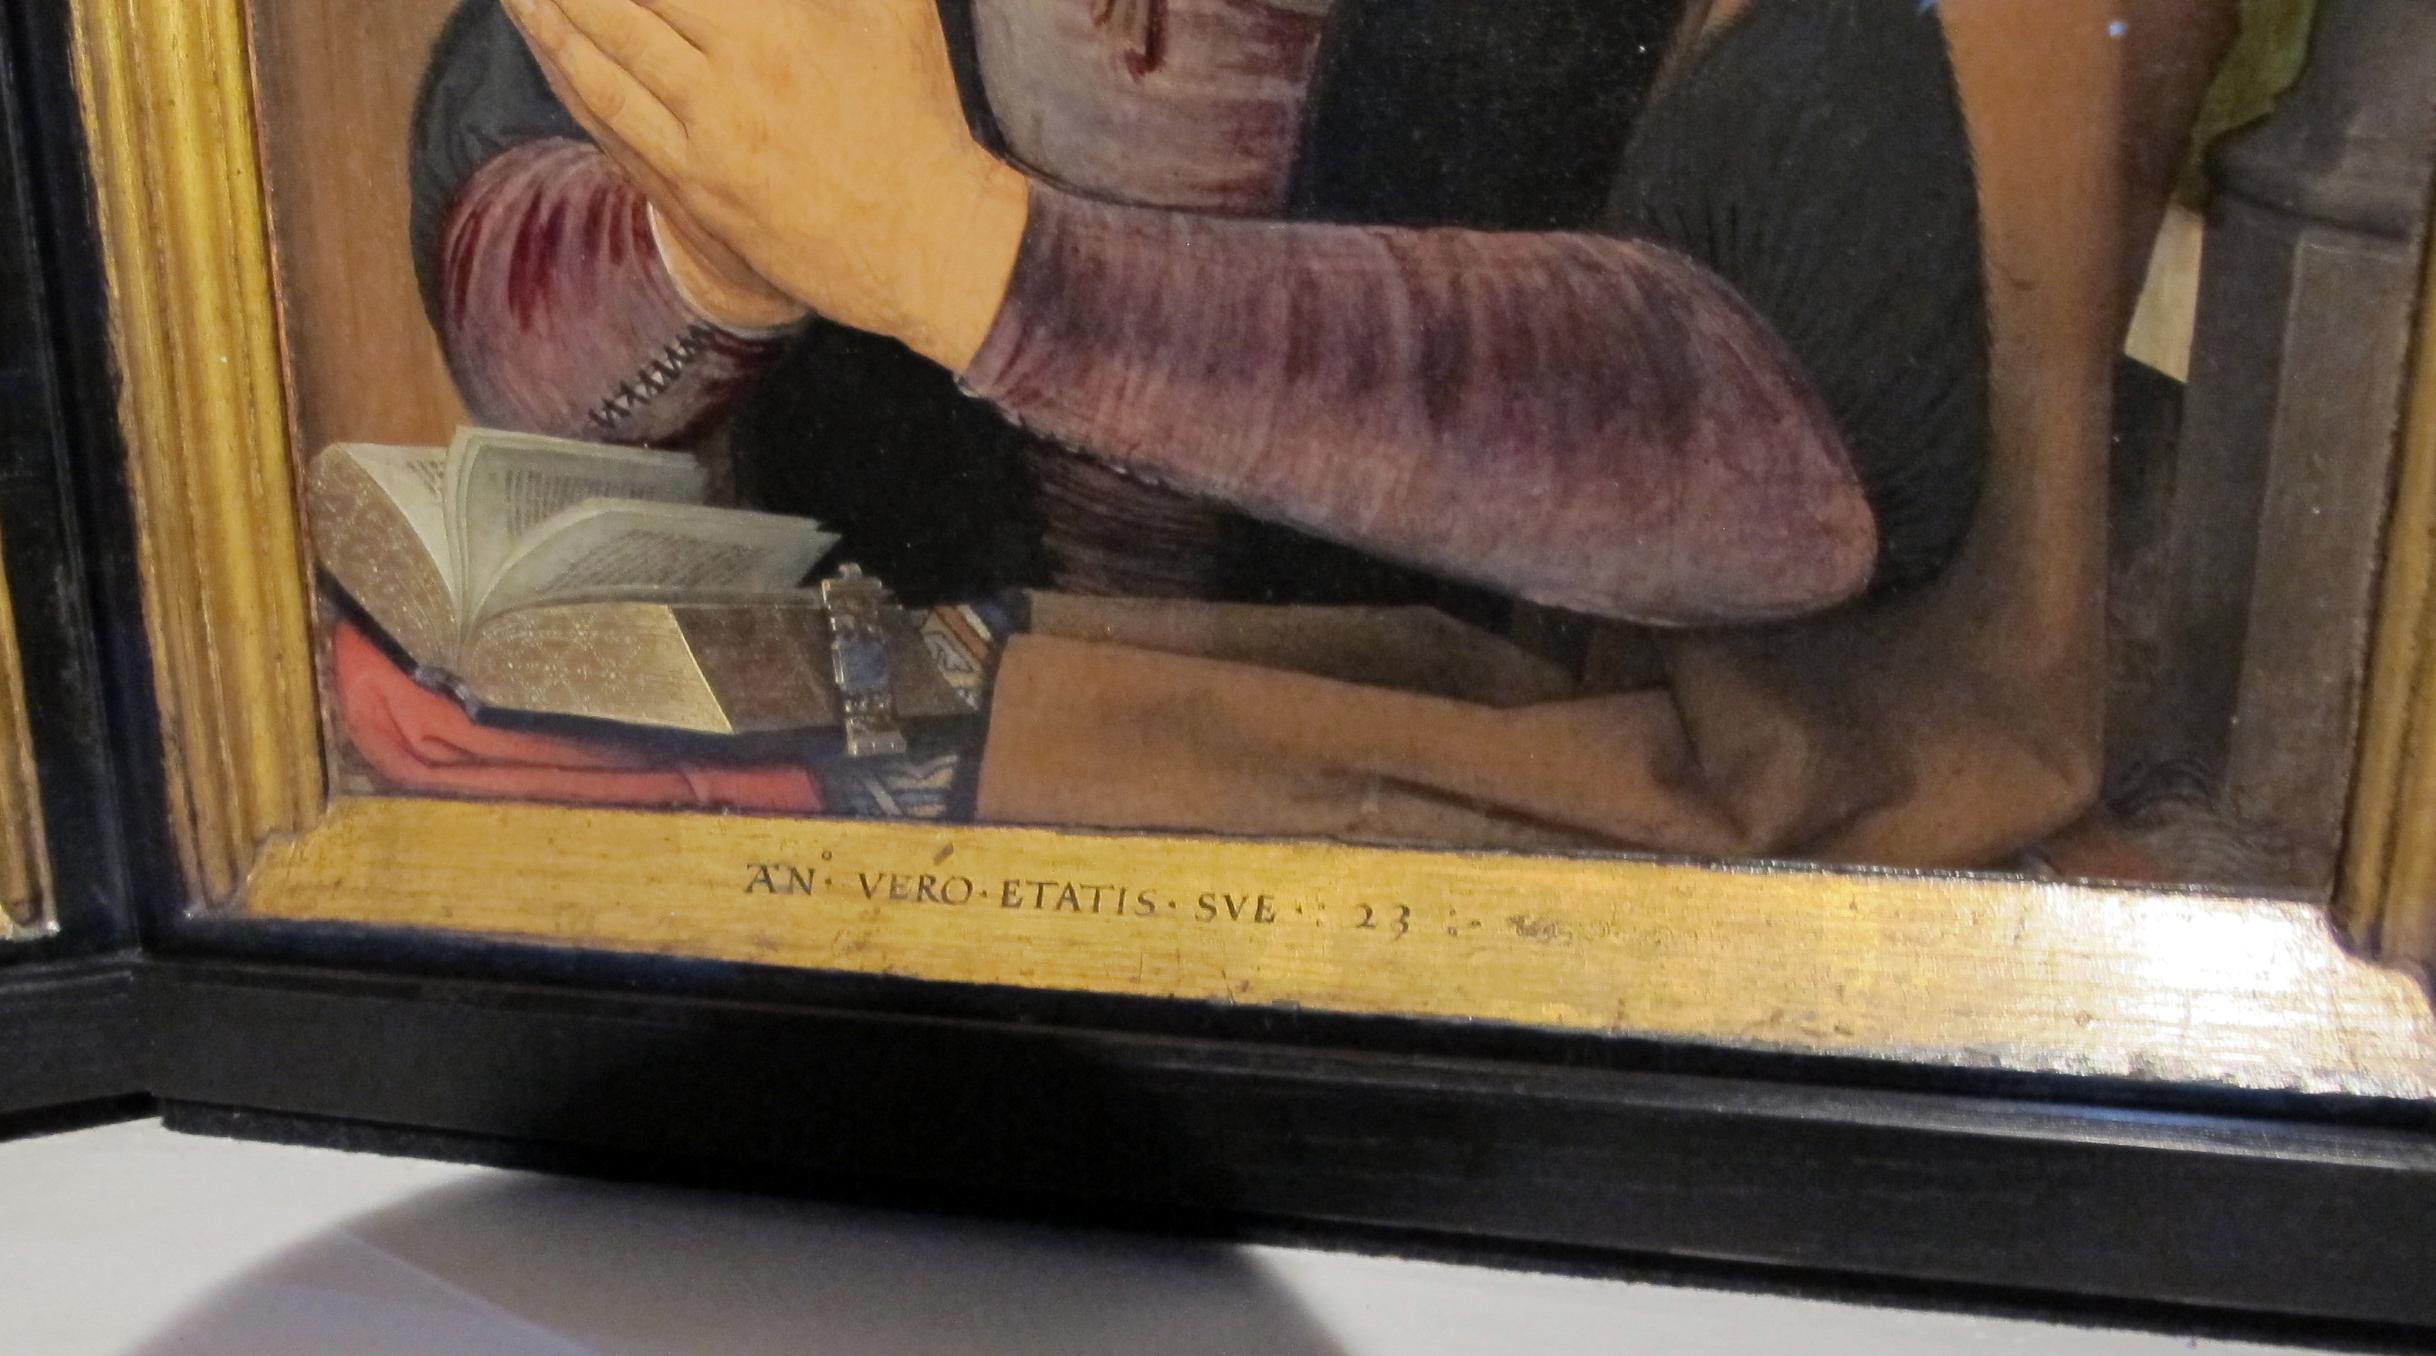 File:Hans memling, dittico di maarten van nieuwenhove, 1487, 06.JPG